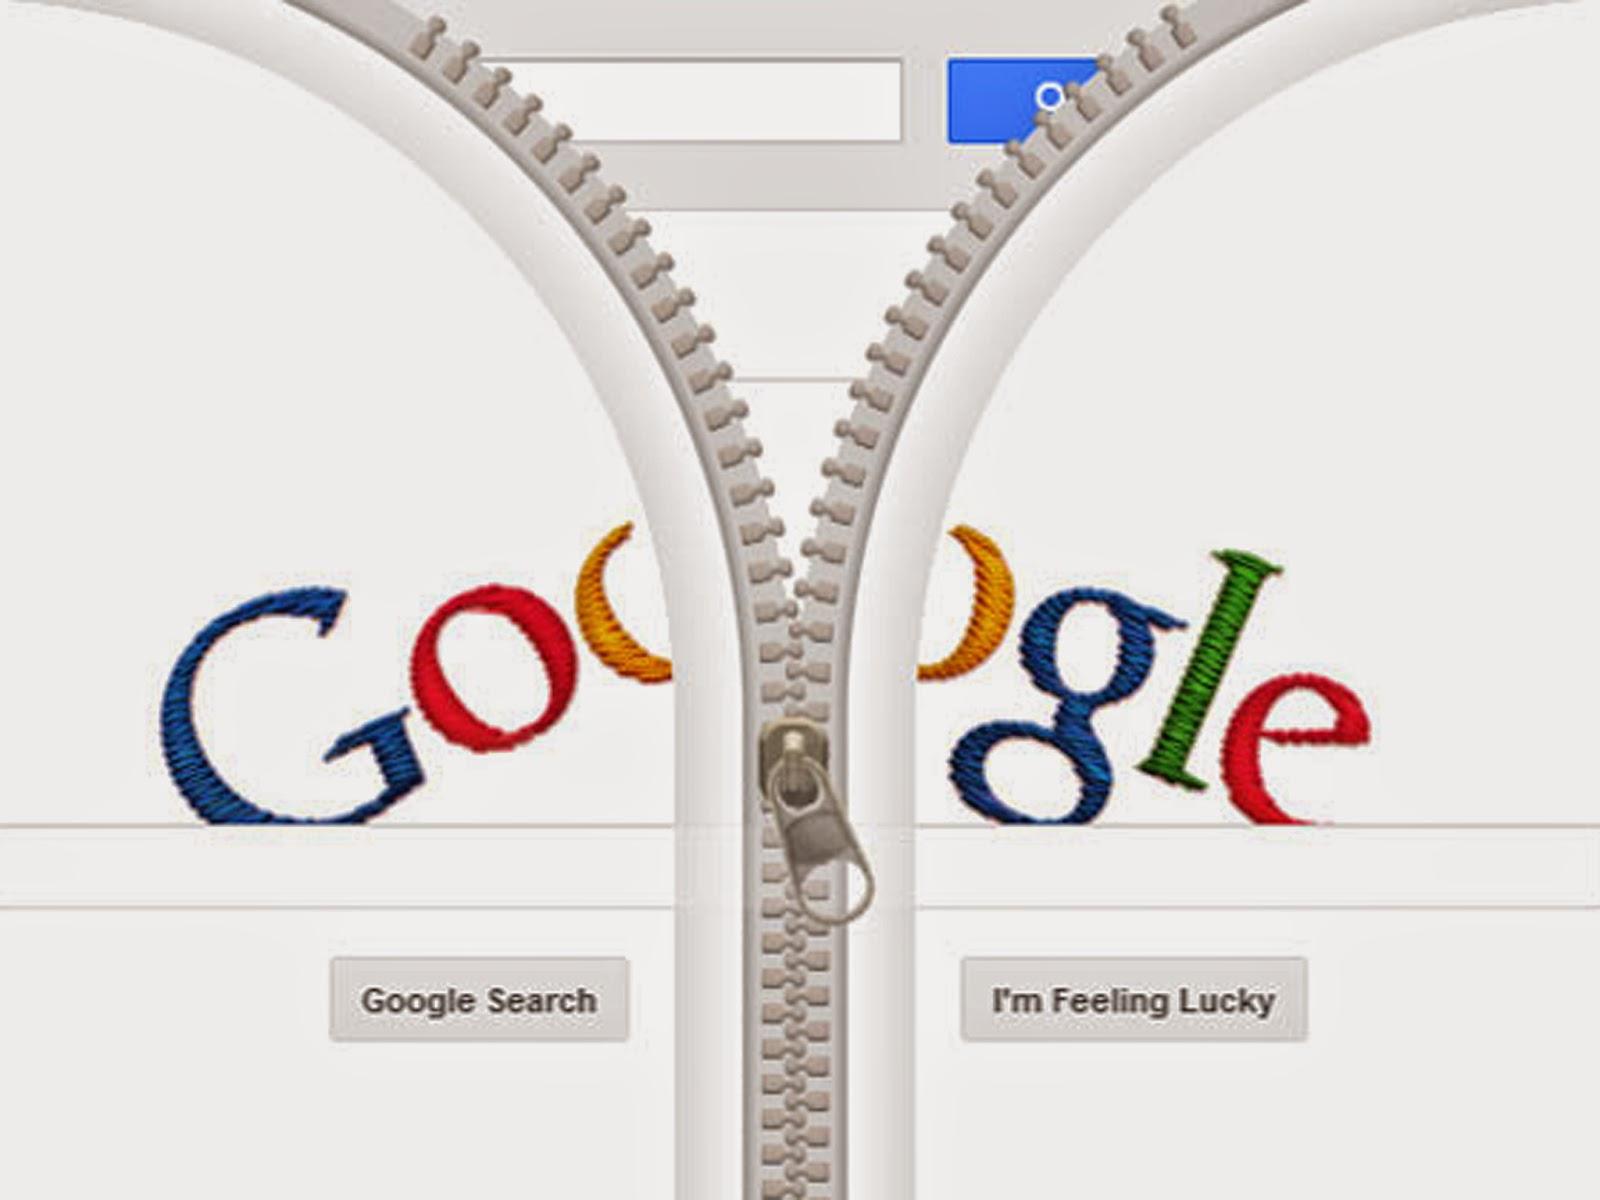 rahasia unik google , keyword google unik , google space , google terminal , google gravity , kata kunci google yang tersembunyi , google sphere , google zipper